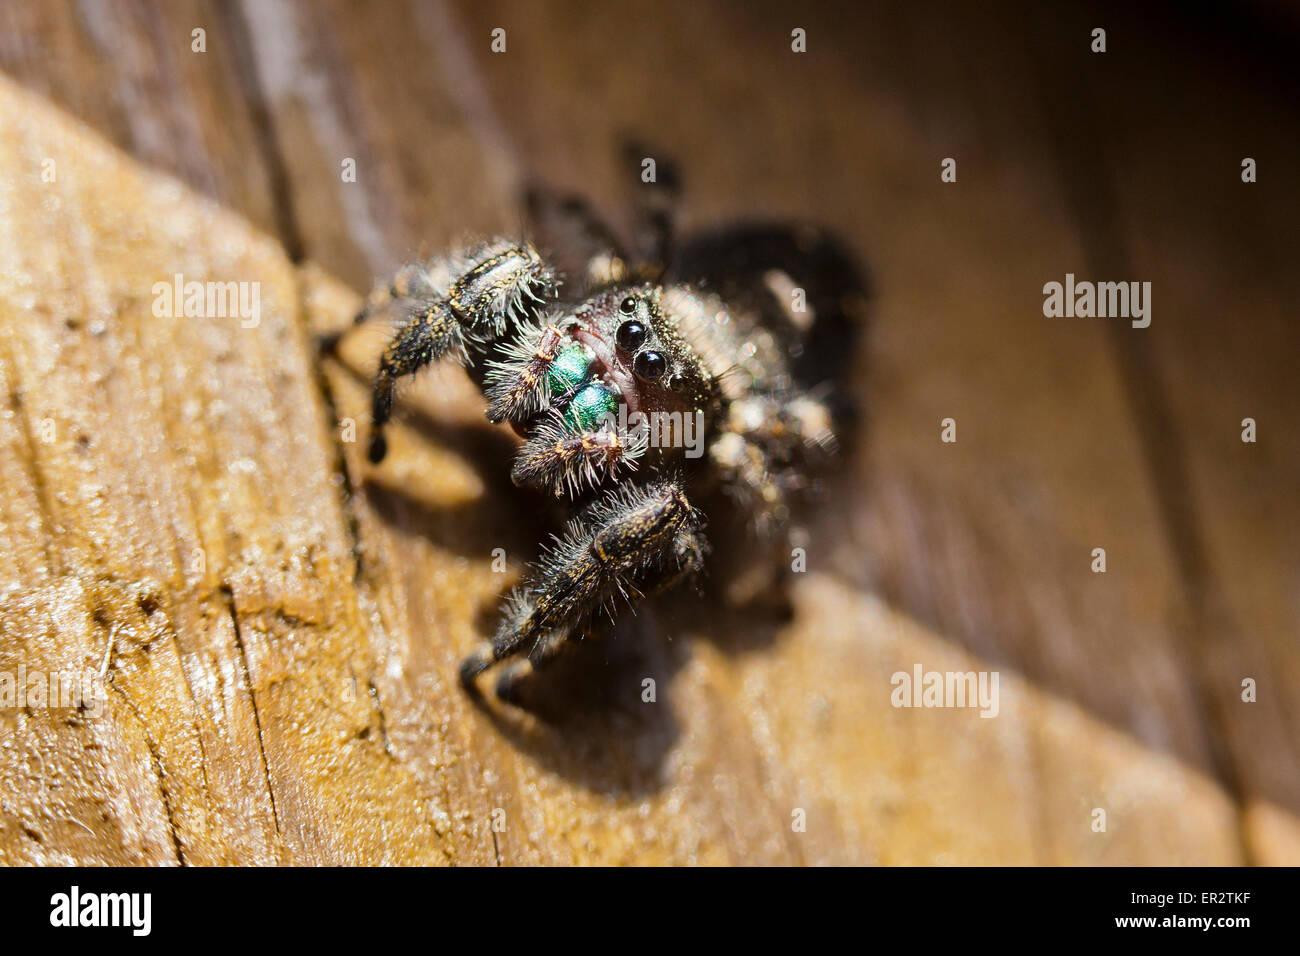 'Negrita' Puente saltando (araña Phidippus audax) - Virginia EE.UU. Imagen De Stock